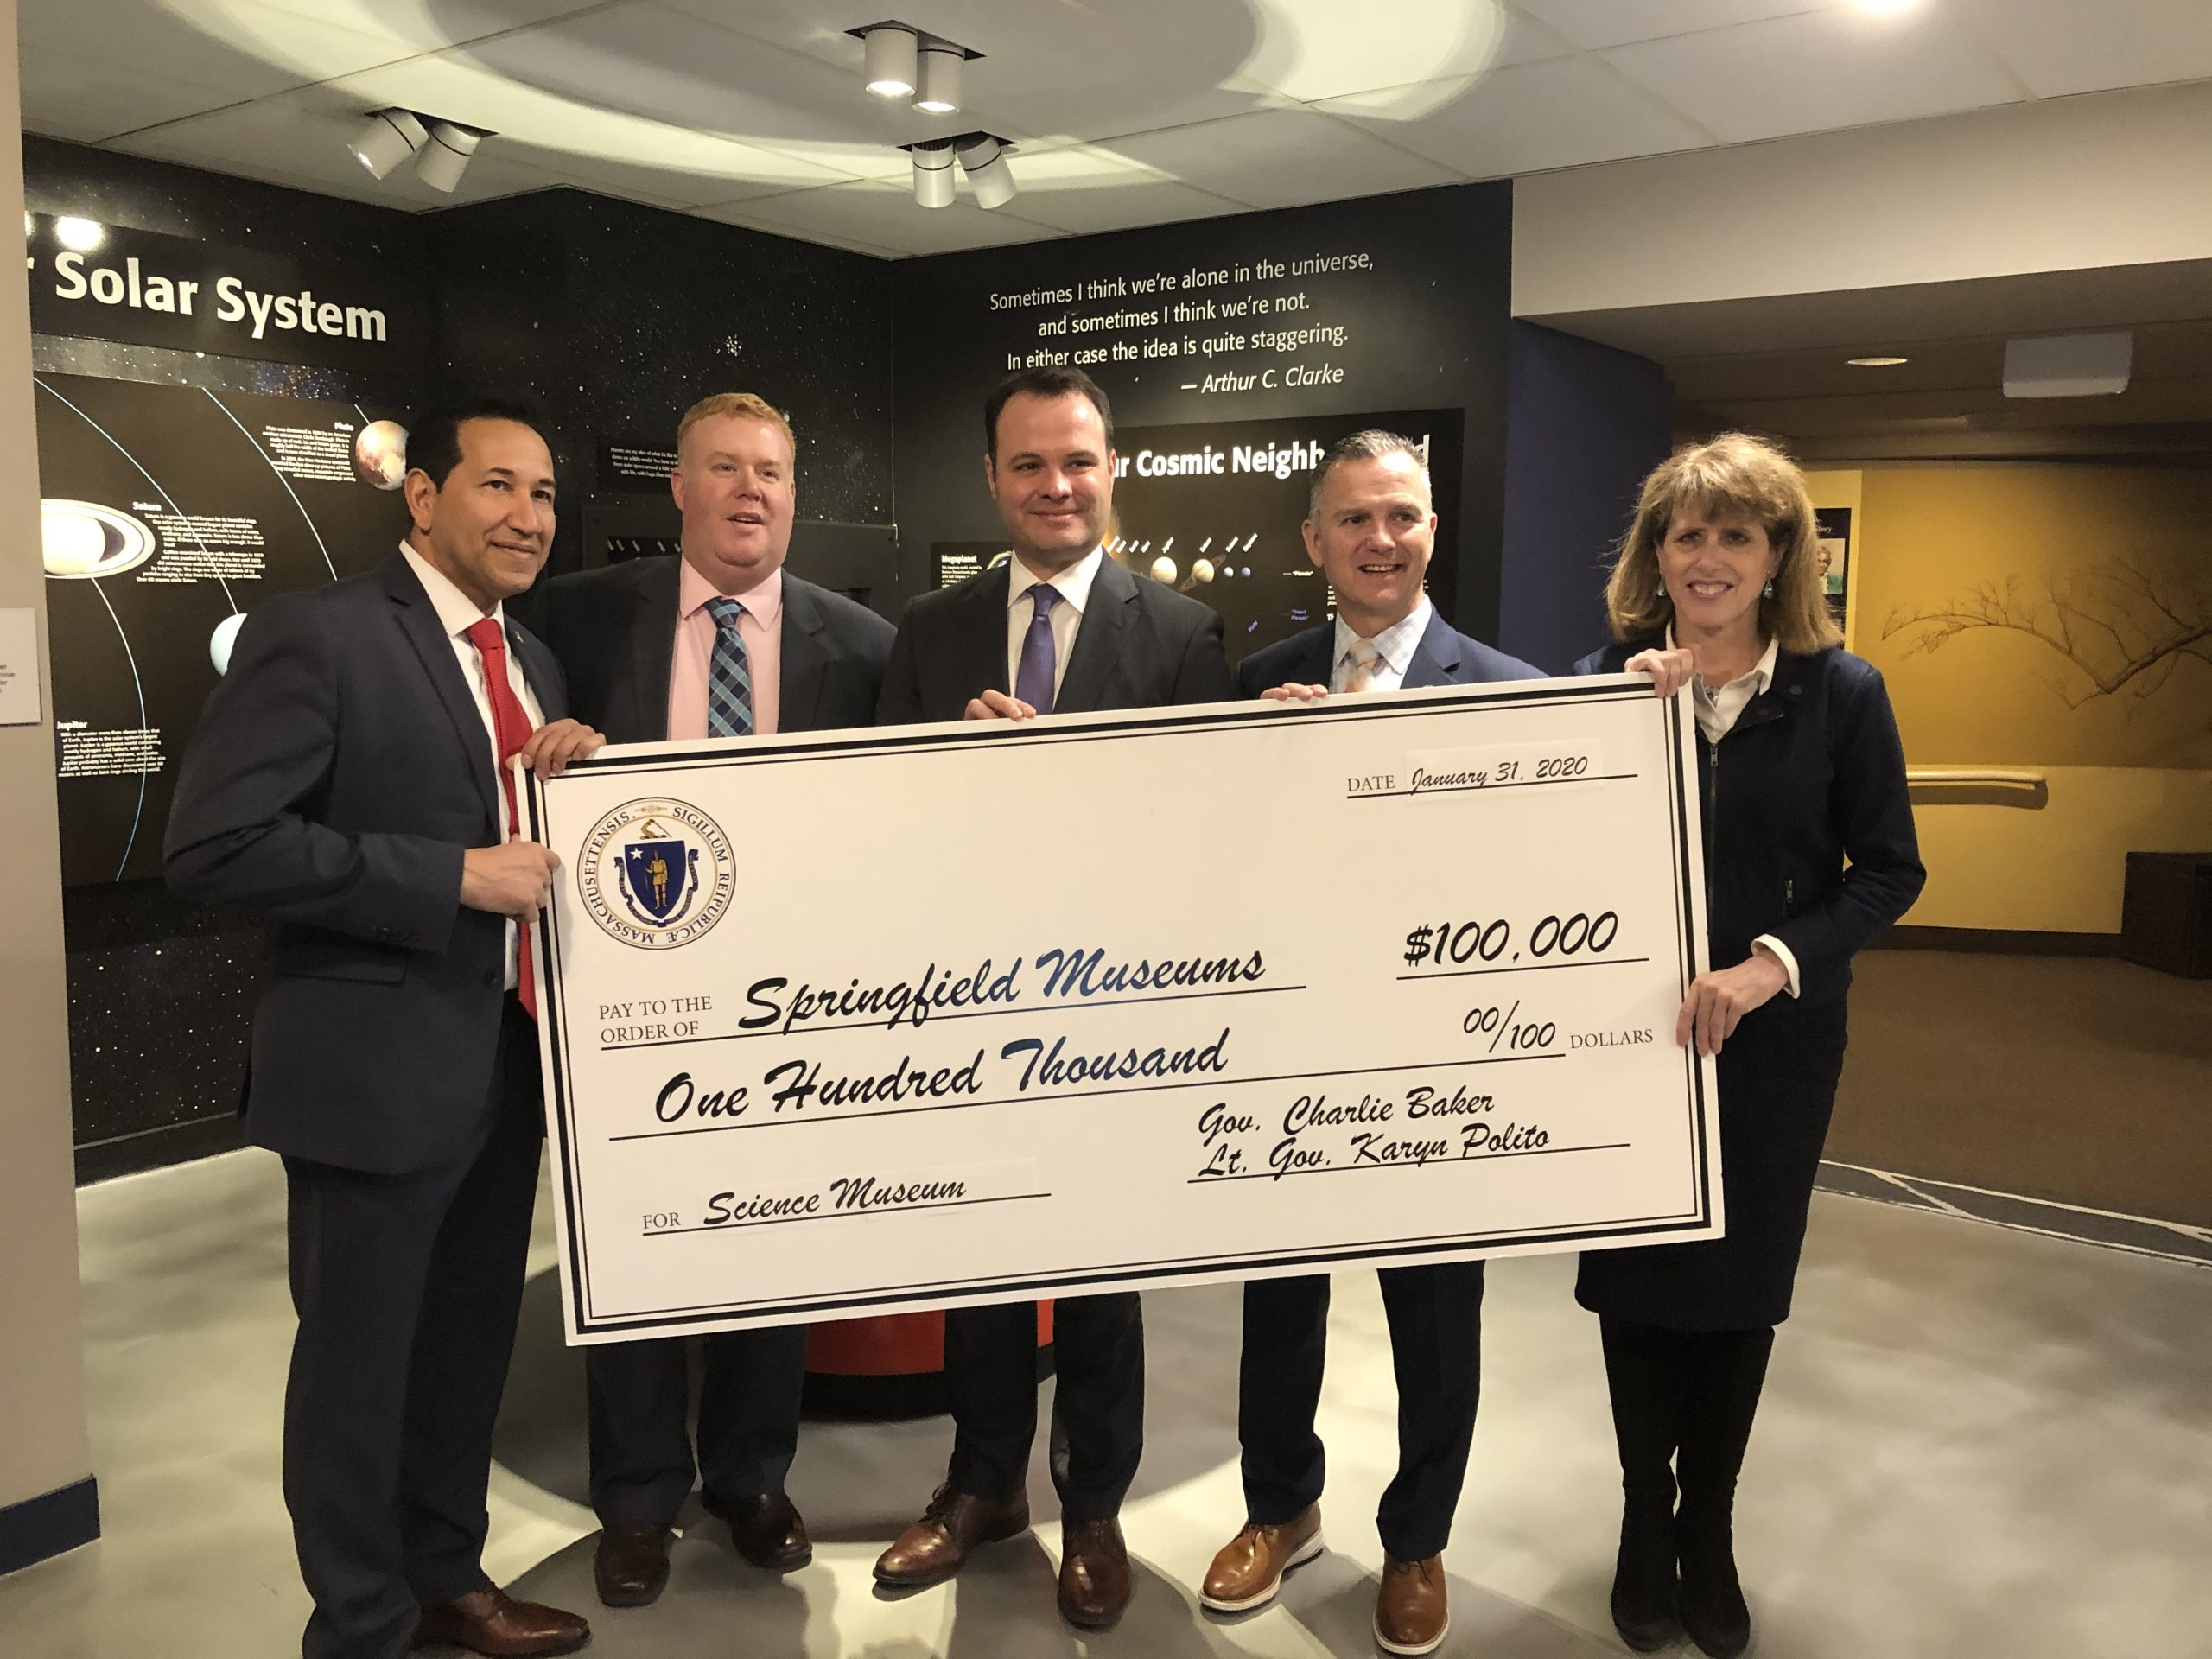 Legislators Celebrate Improvements To The Springfield Science Museum